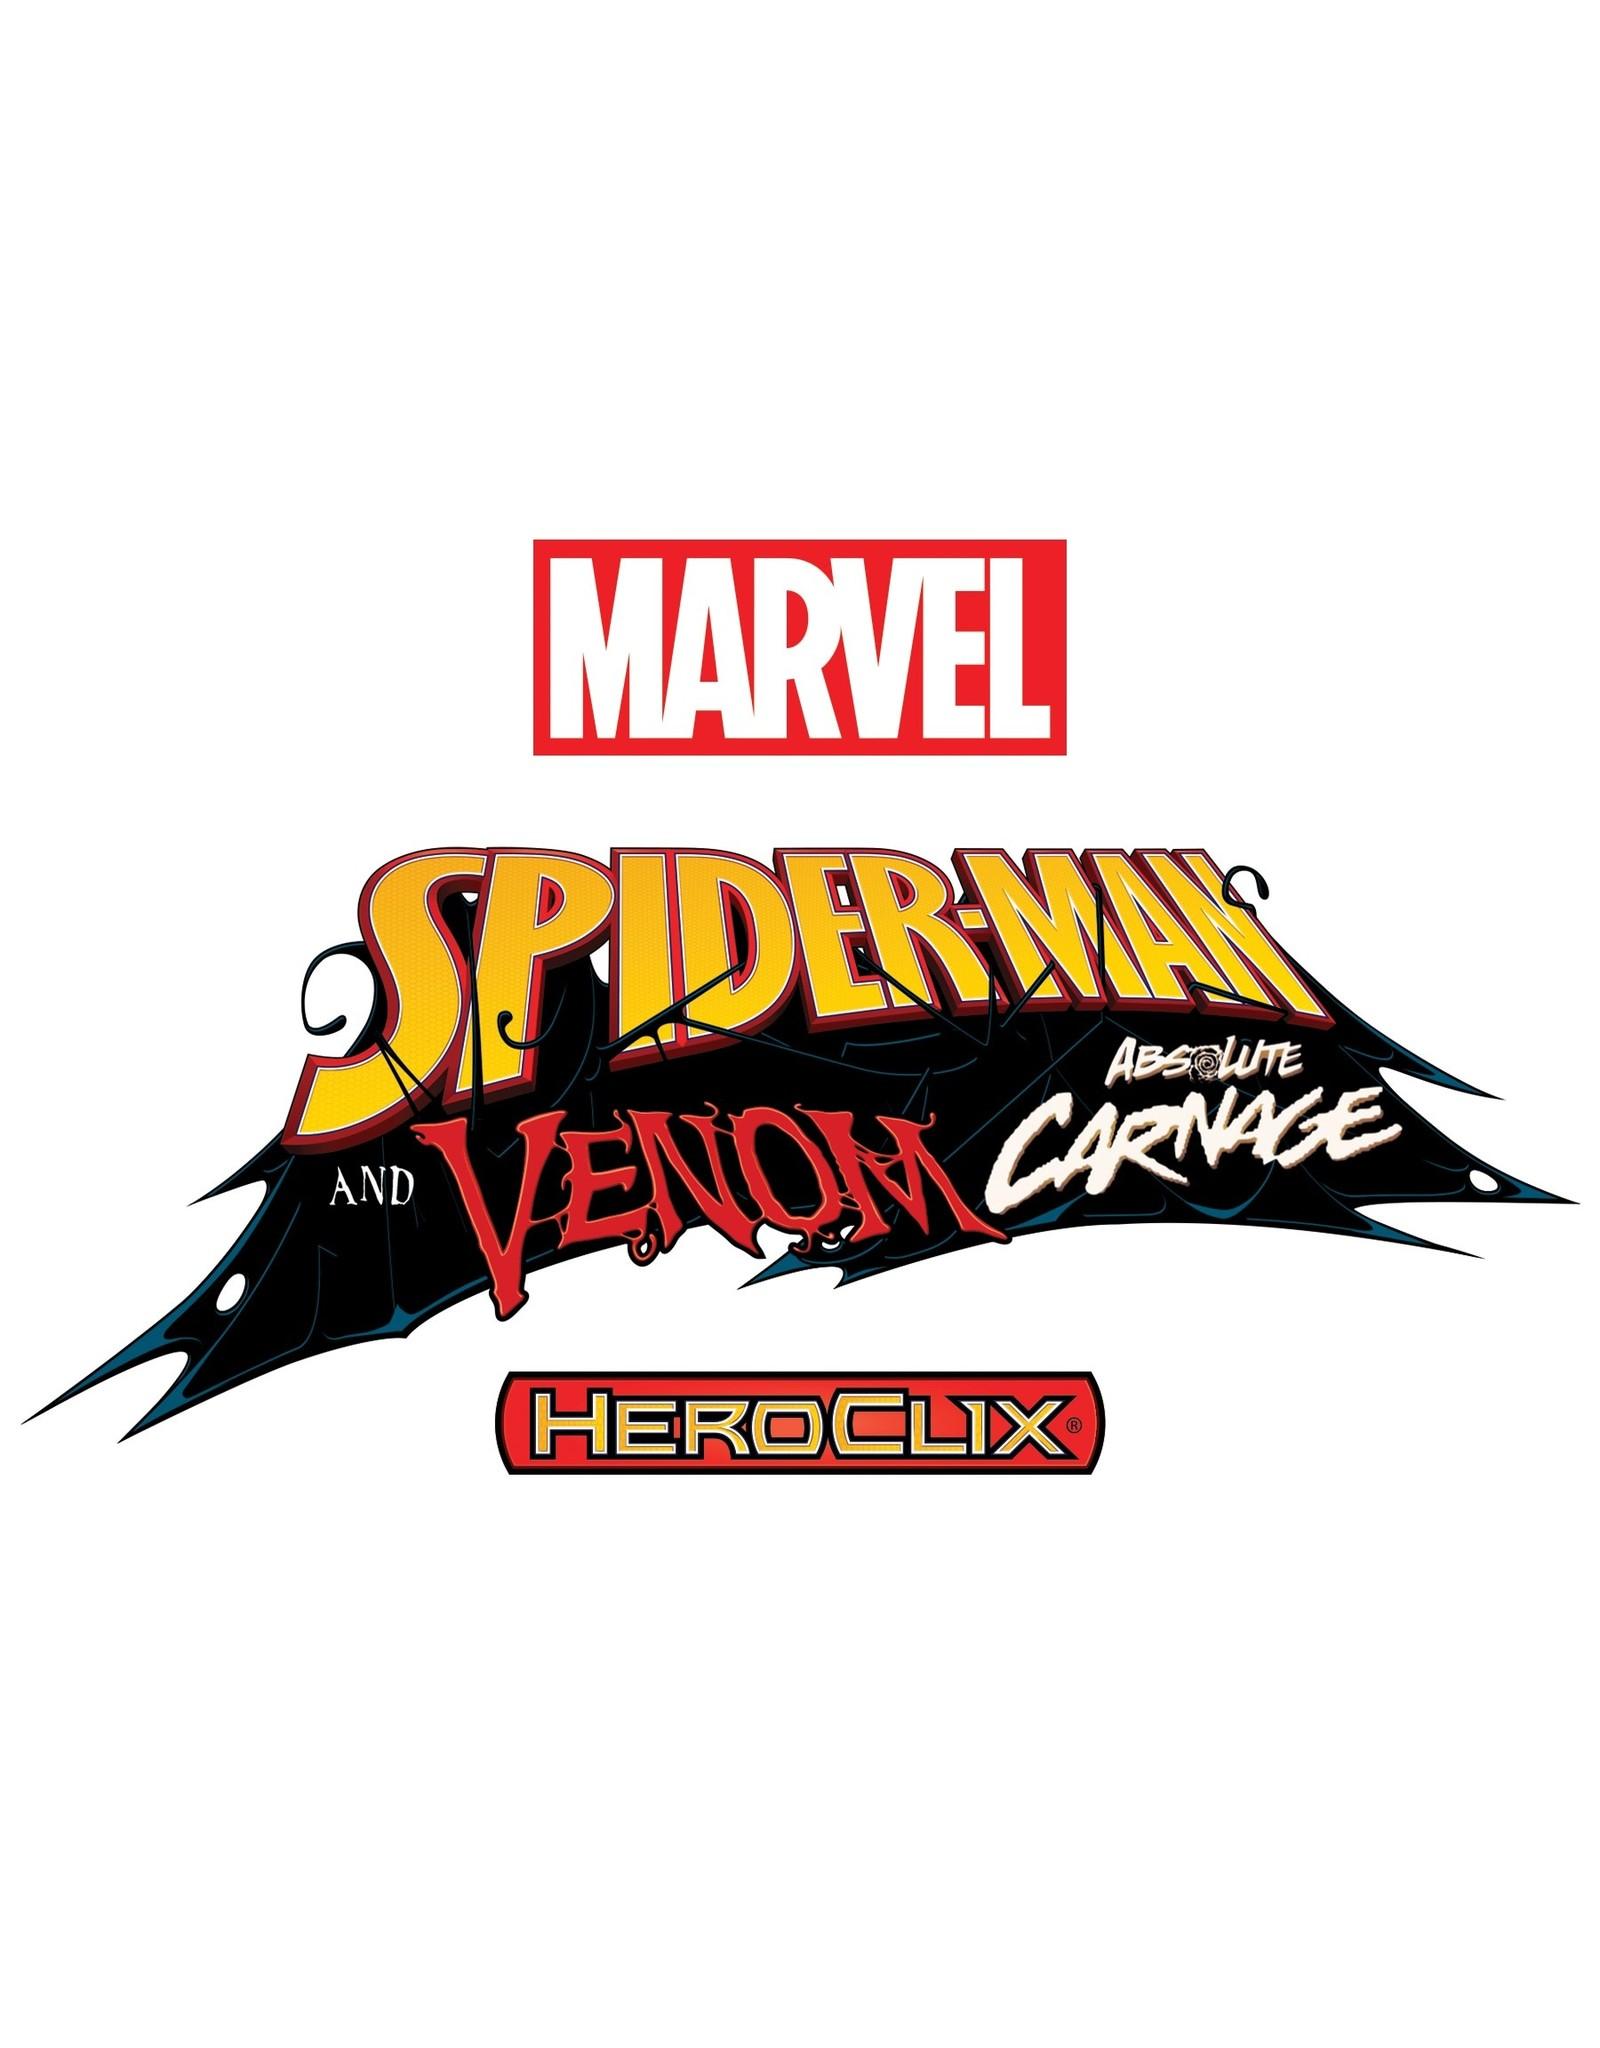 WizKids Marvel HeroClix: Spider-Man and Venom Absolute Carnage Booster Brick (10)